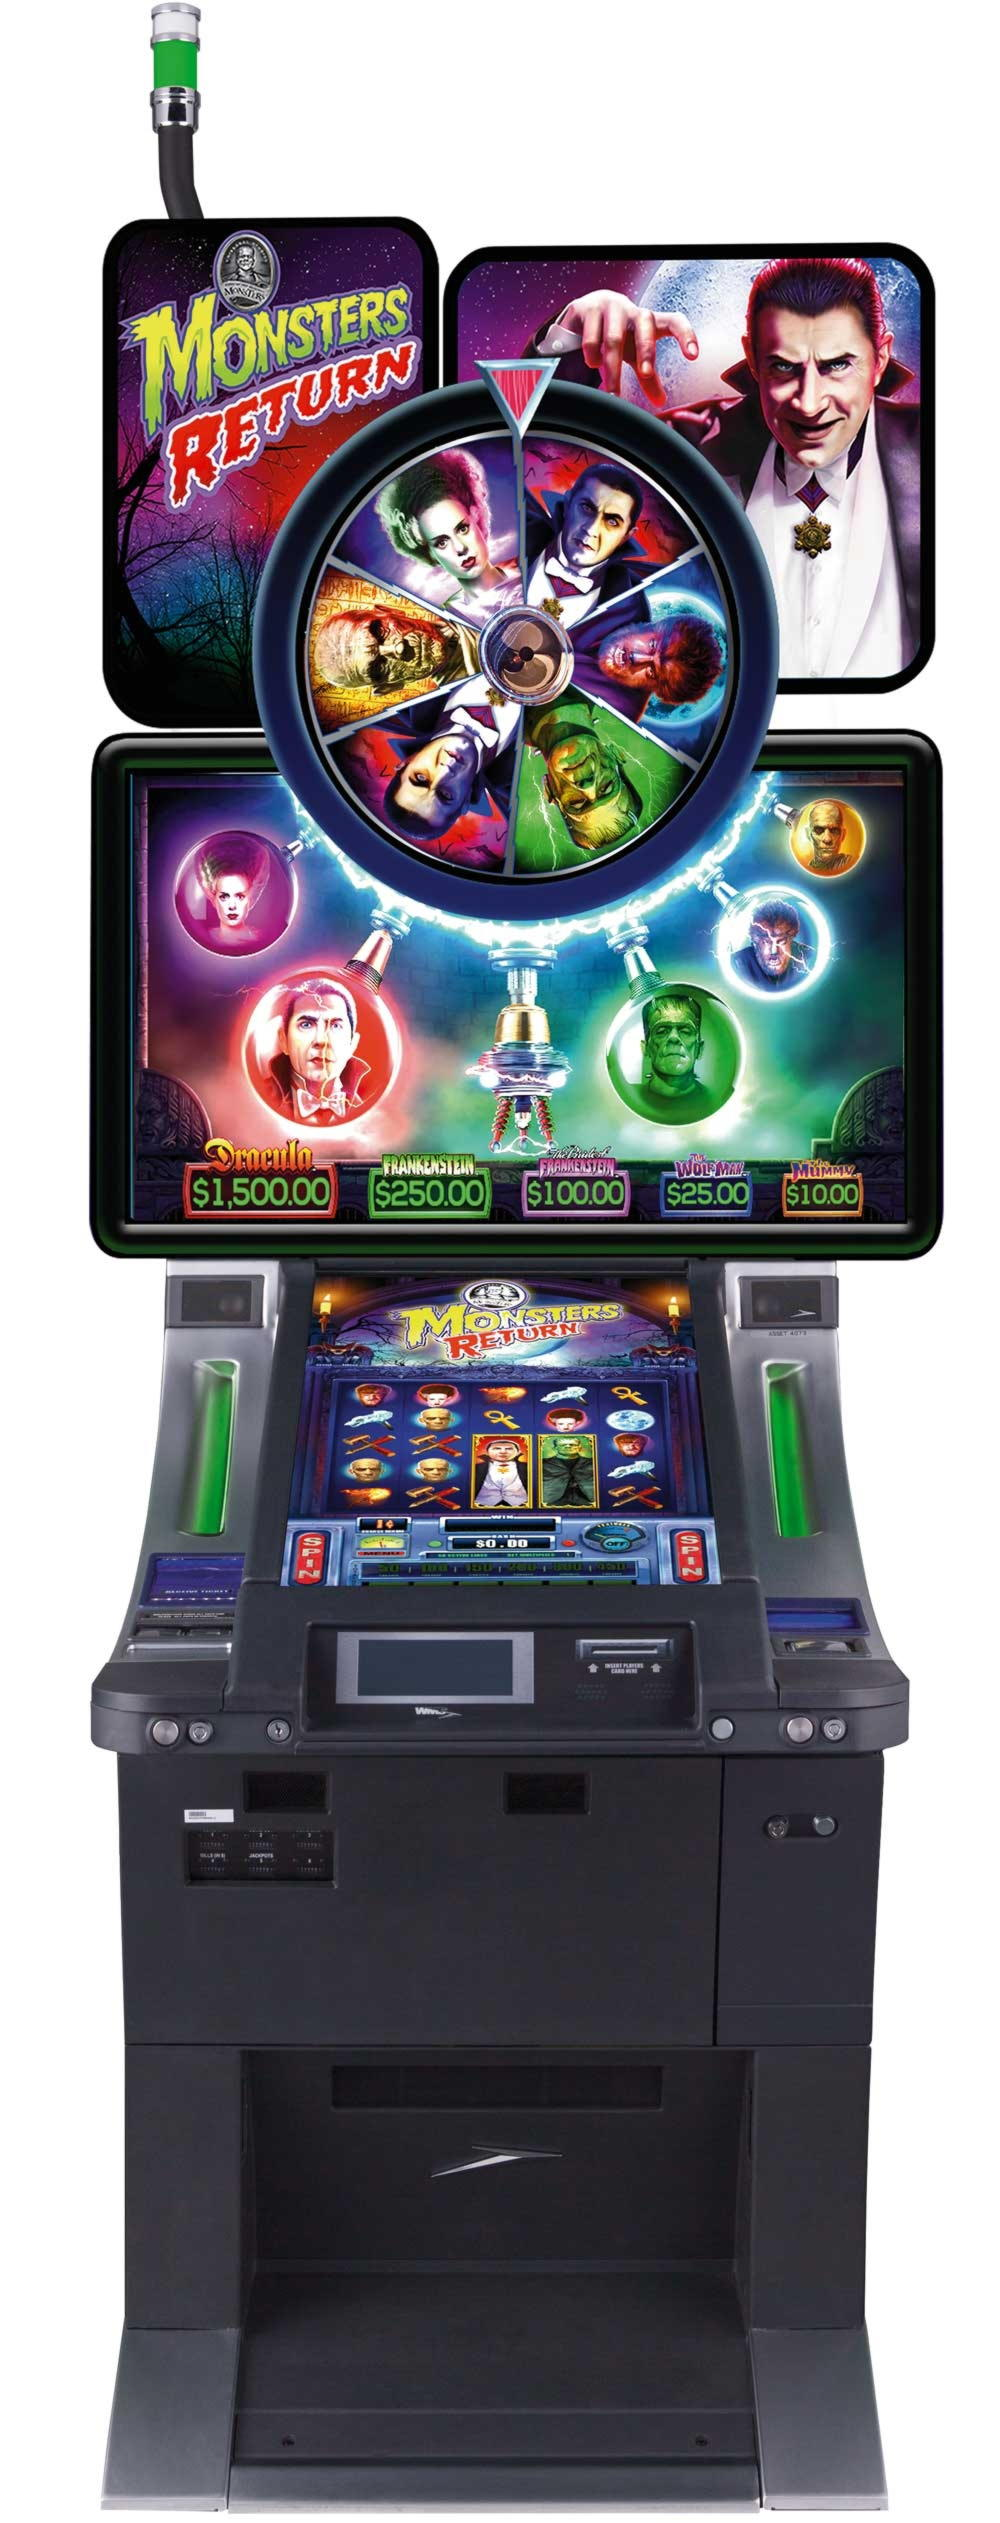 525% Match på et kasino på Ikibu Casino